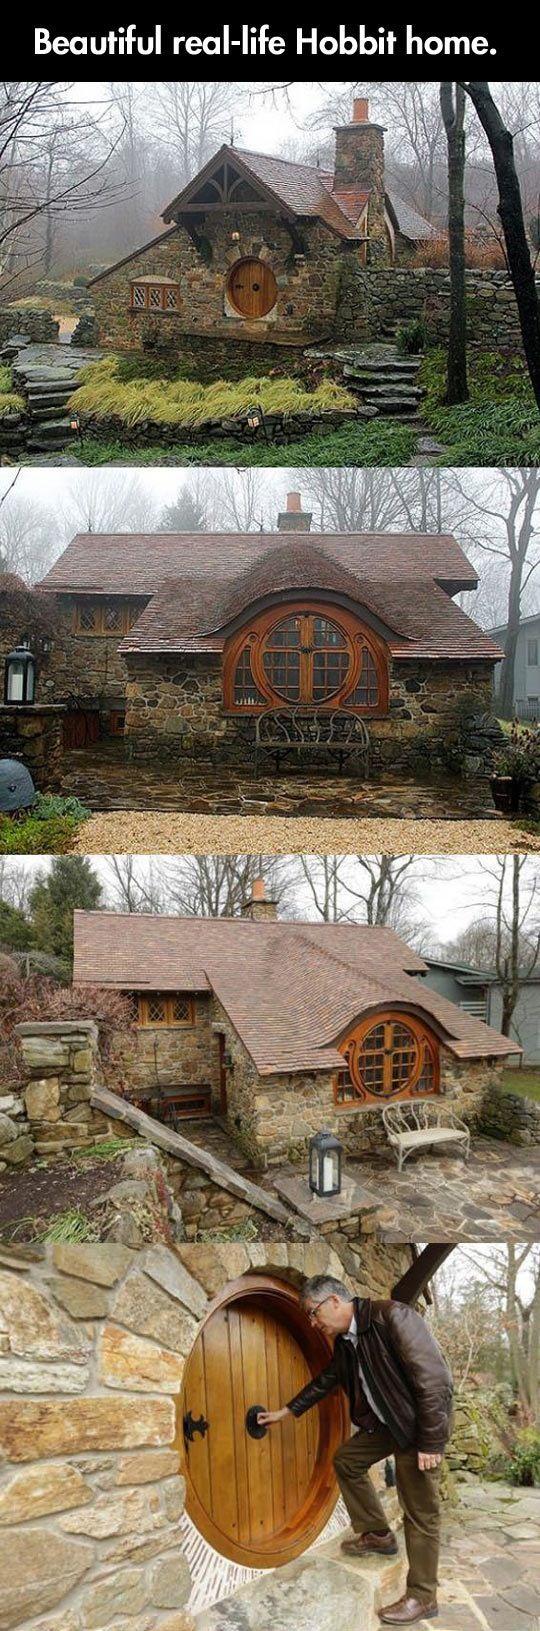 hobbit house hobbit houses pinte. Black Bedroom Furniture Sets. Home Design Ideas